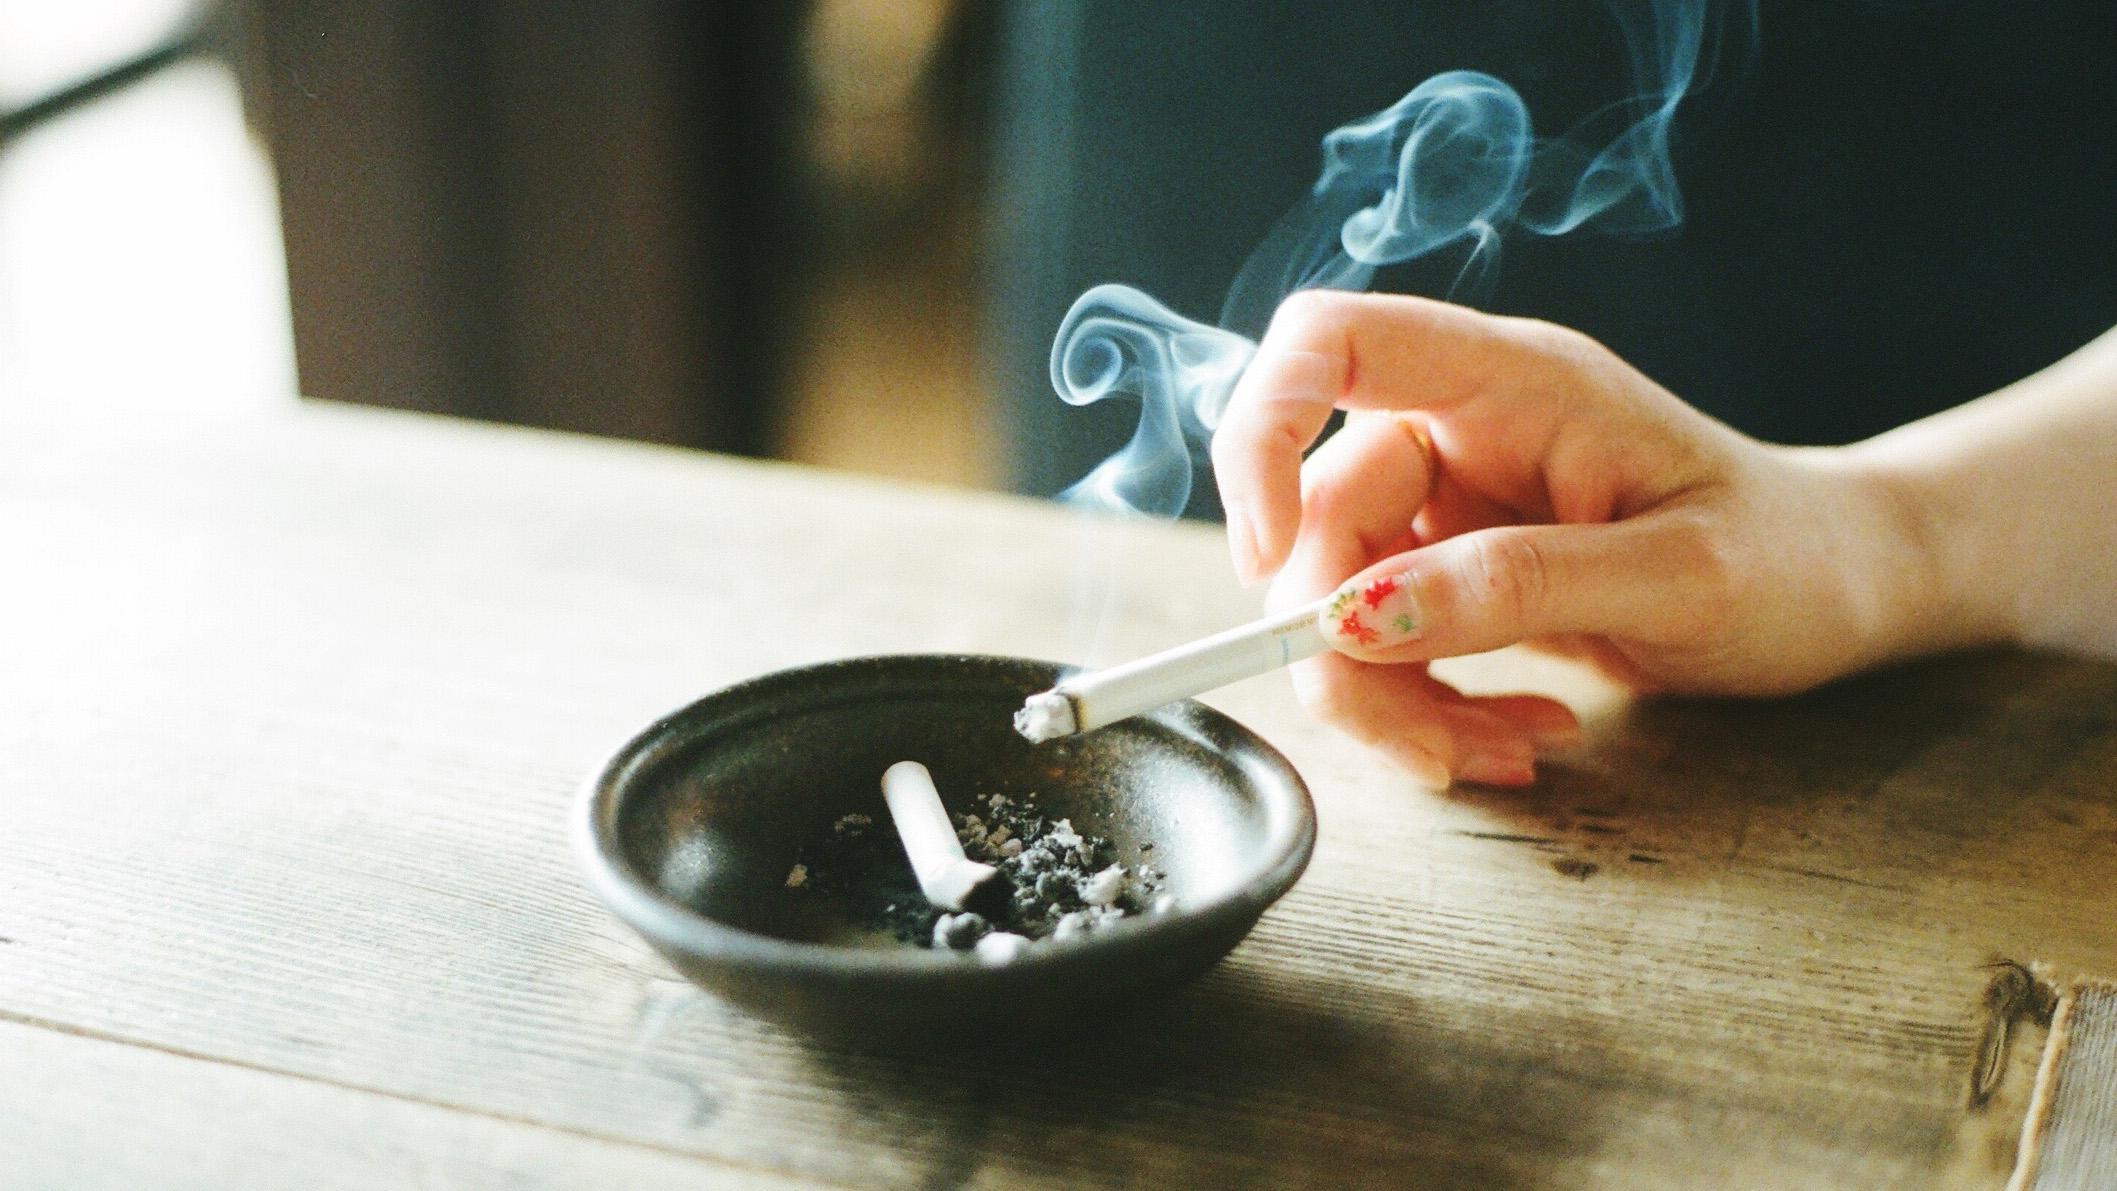 cigarette companies will air anti smoking ads starting this sunday